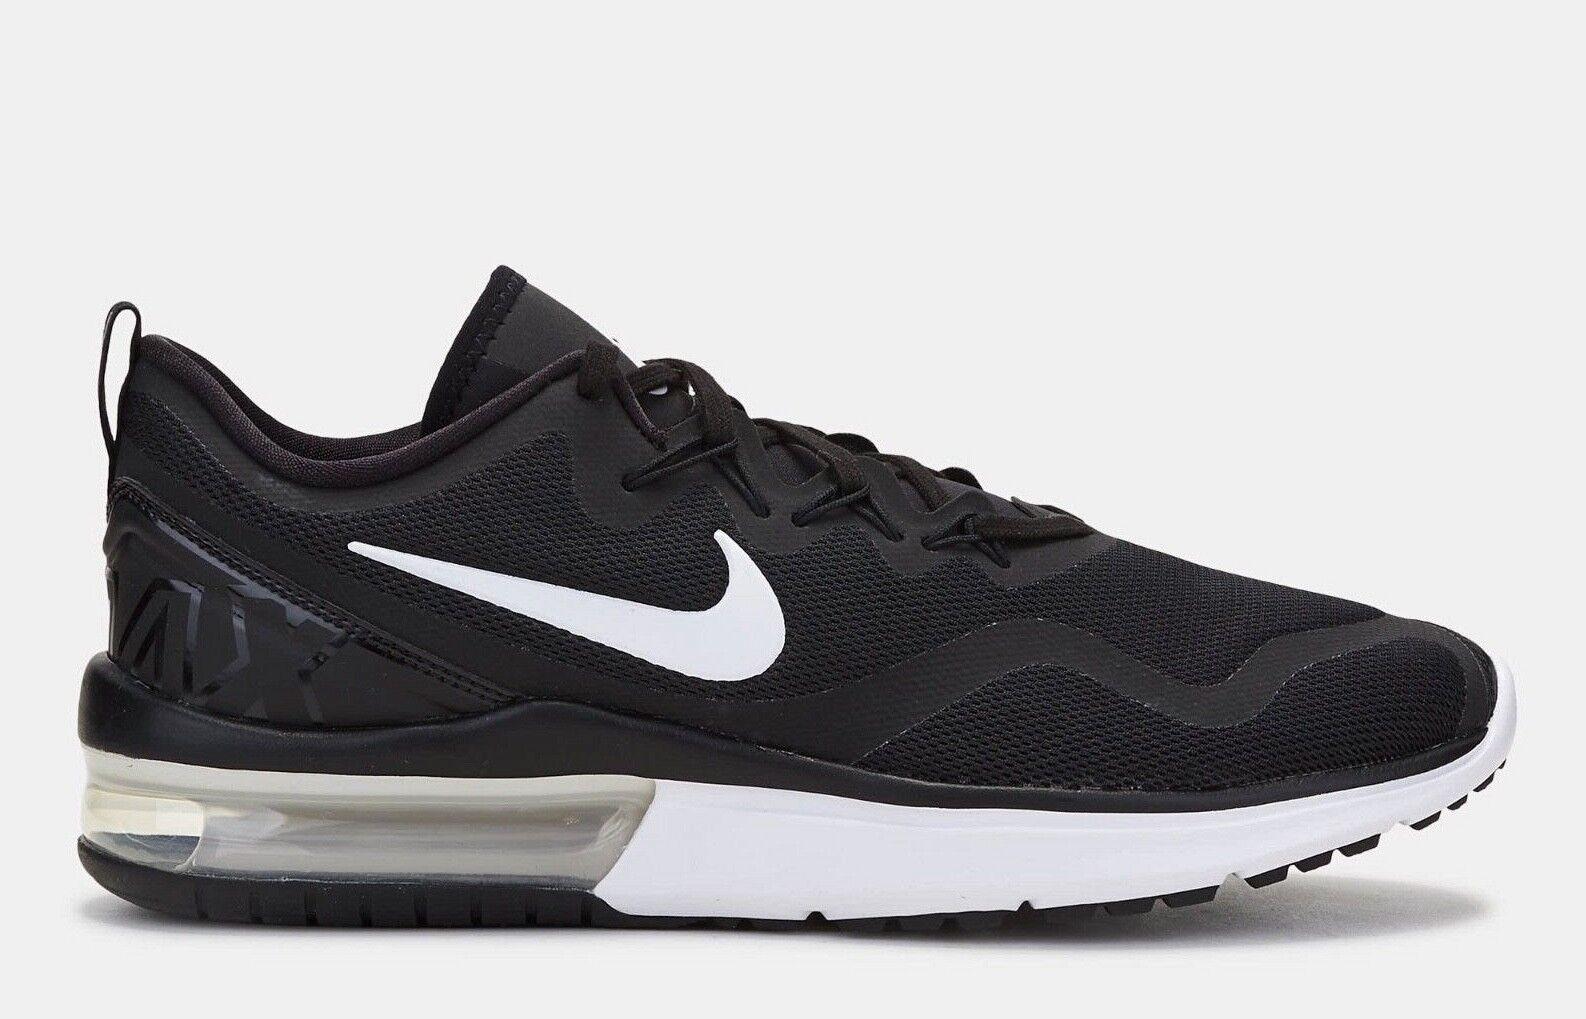 Nike Air Max Fury Black White Running shoes Size 11 Mens Run AA5739 403 New